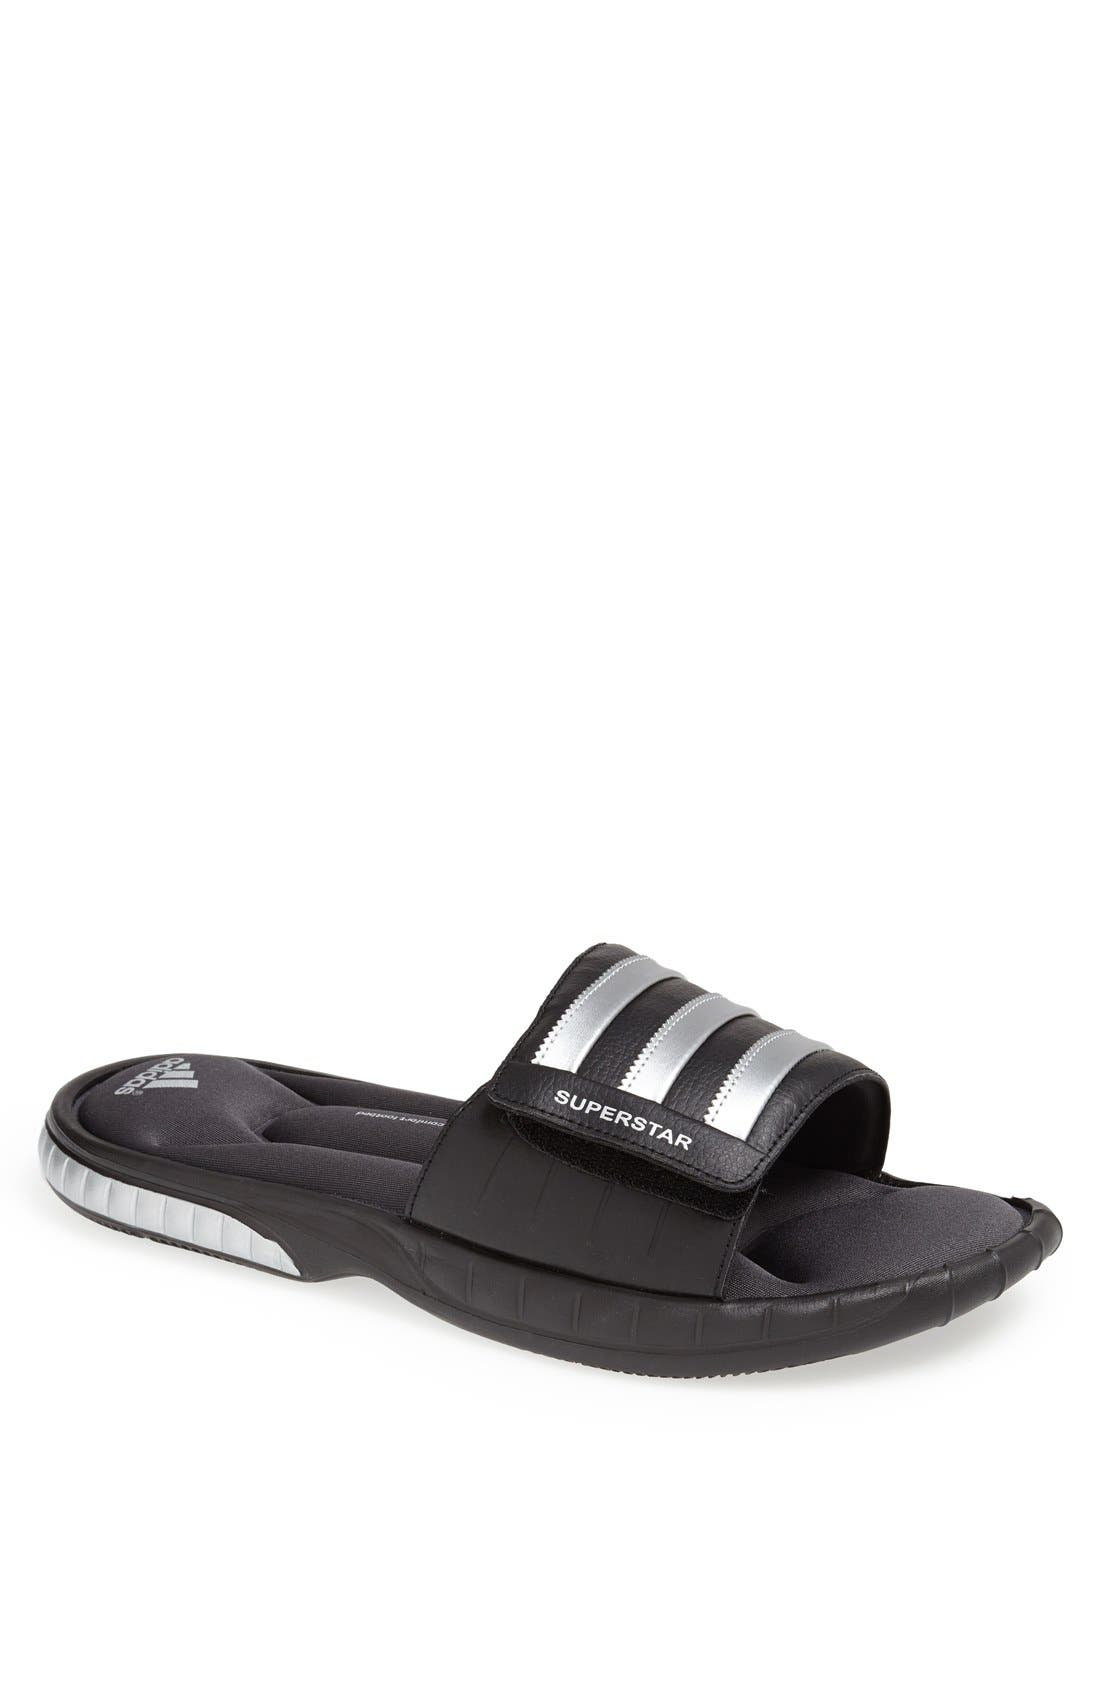 e282fb9cbfef adidas superstar fitfoam sandals on sale   OFF67% Discounts